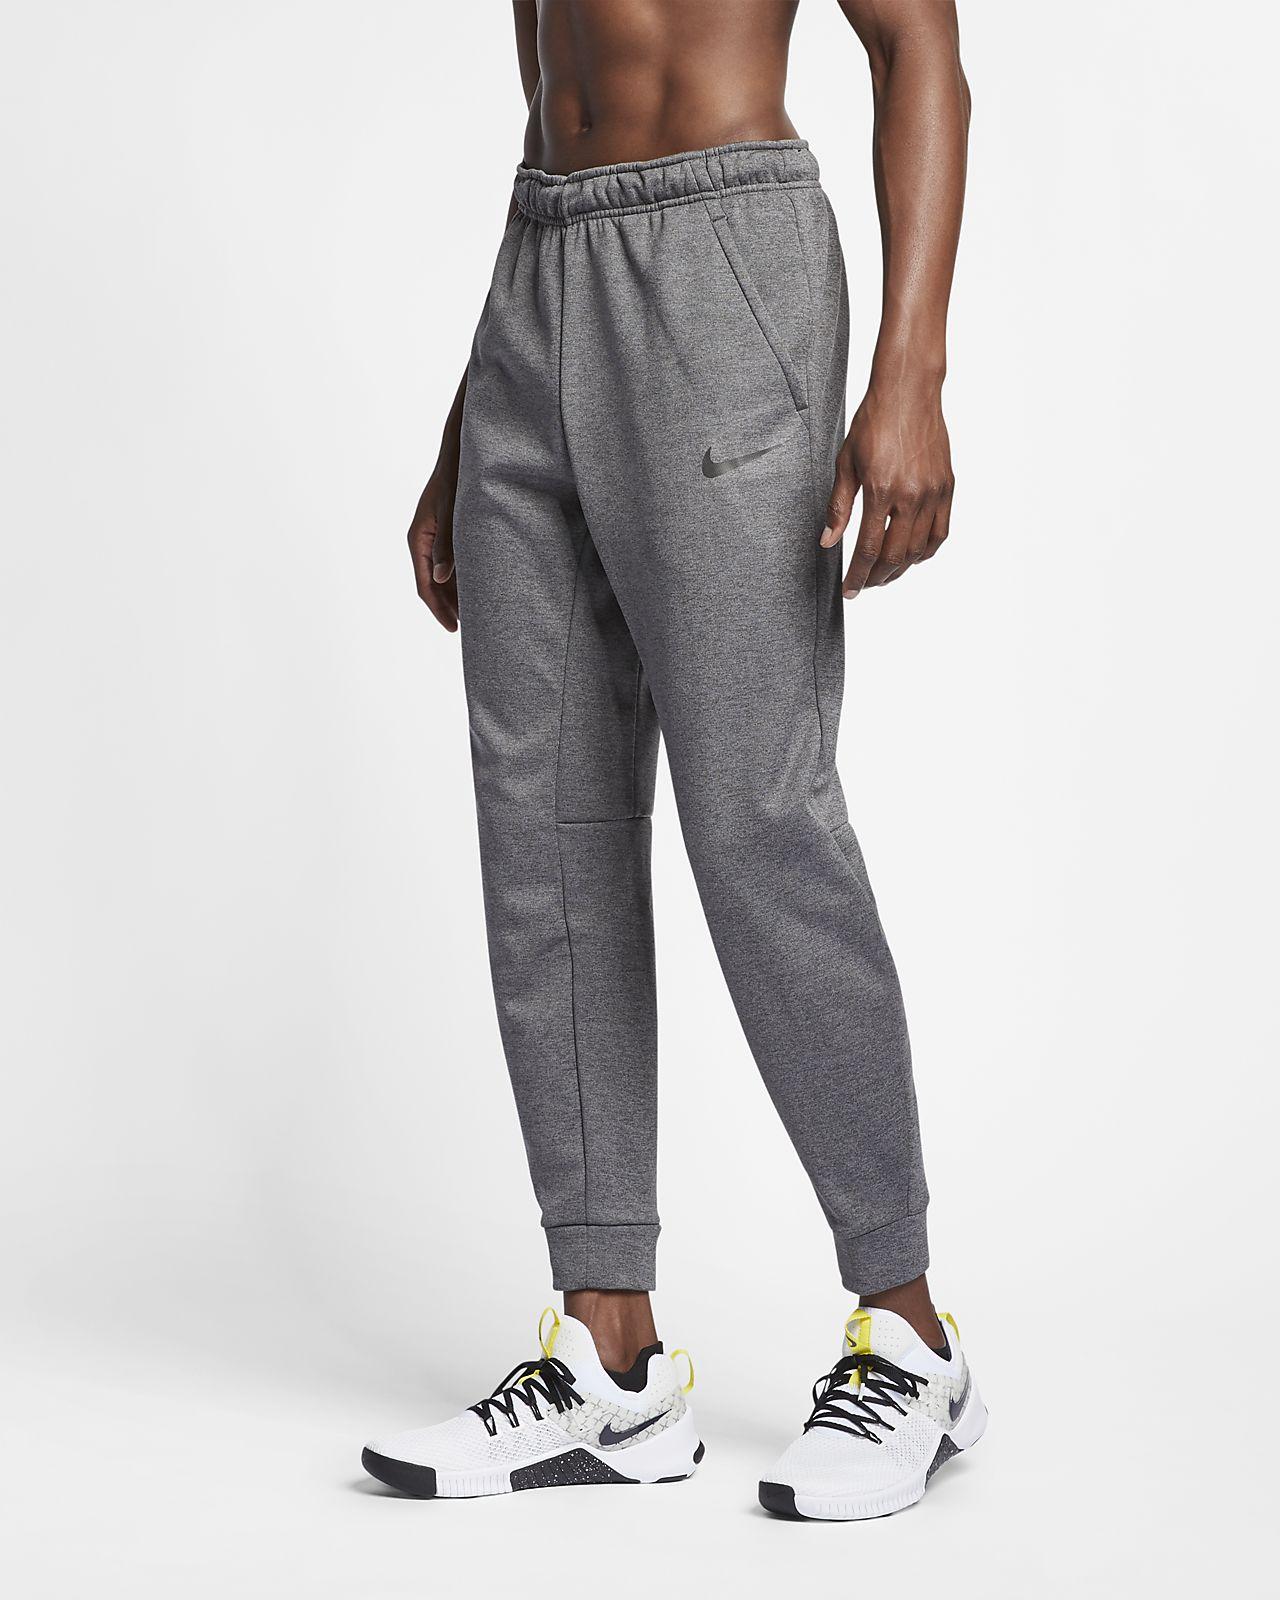 Nike Therma Pantalons cenyits d'entrenament - Home